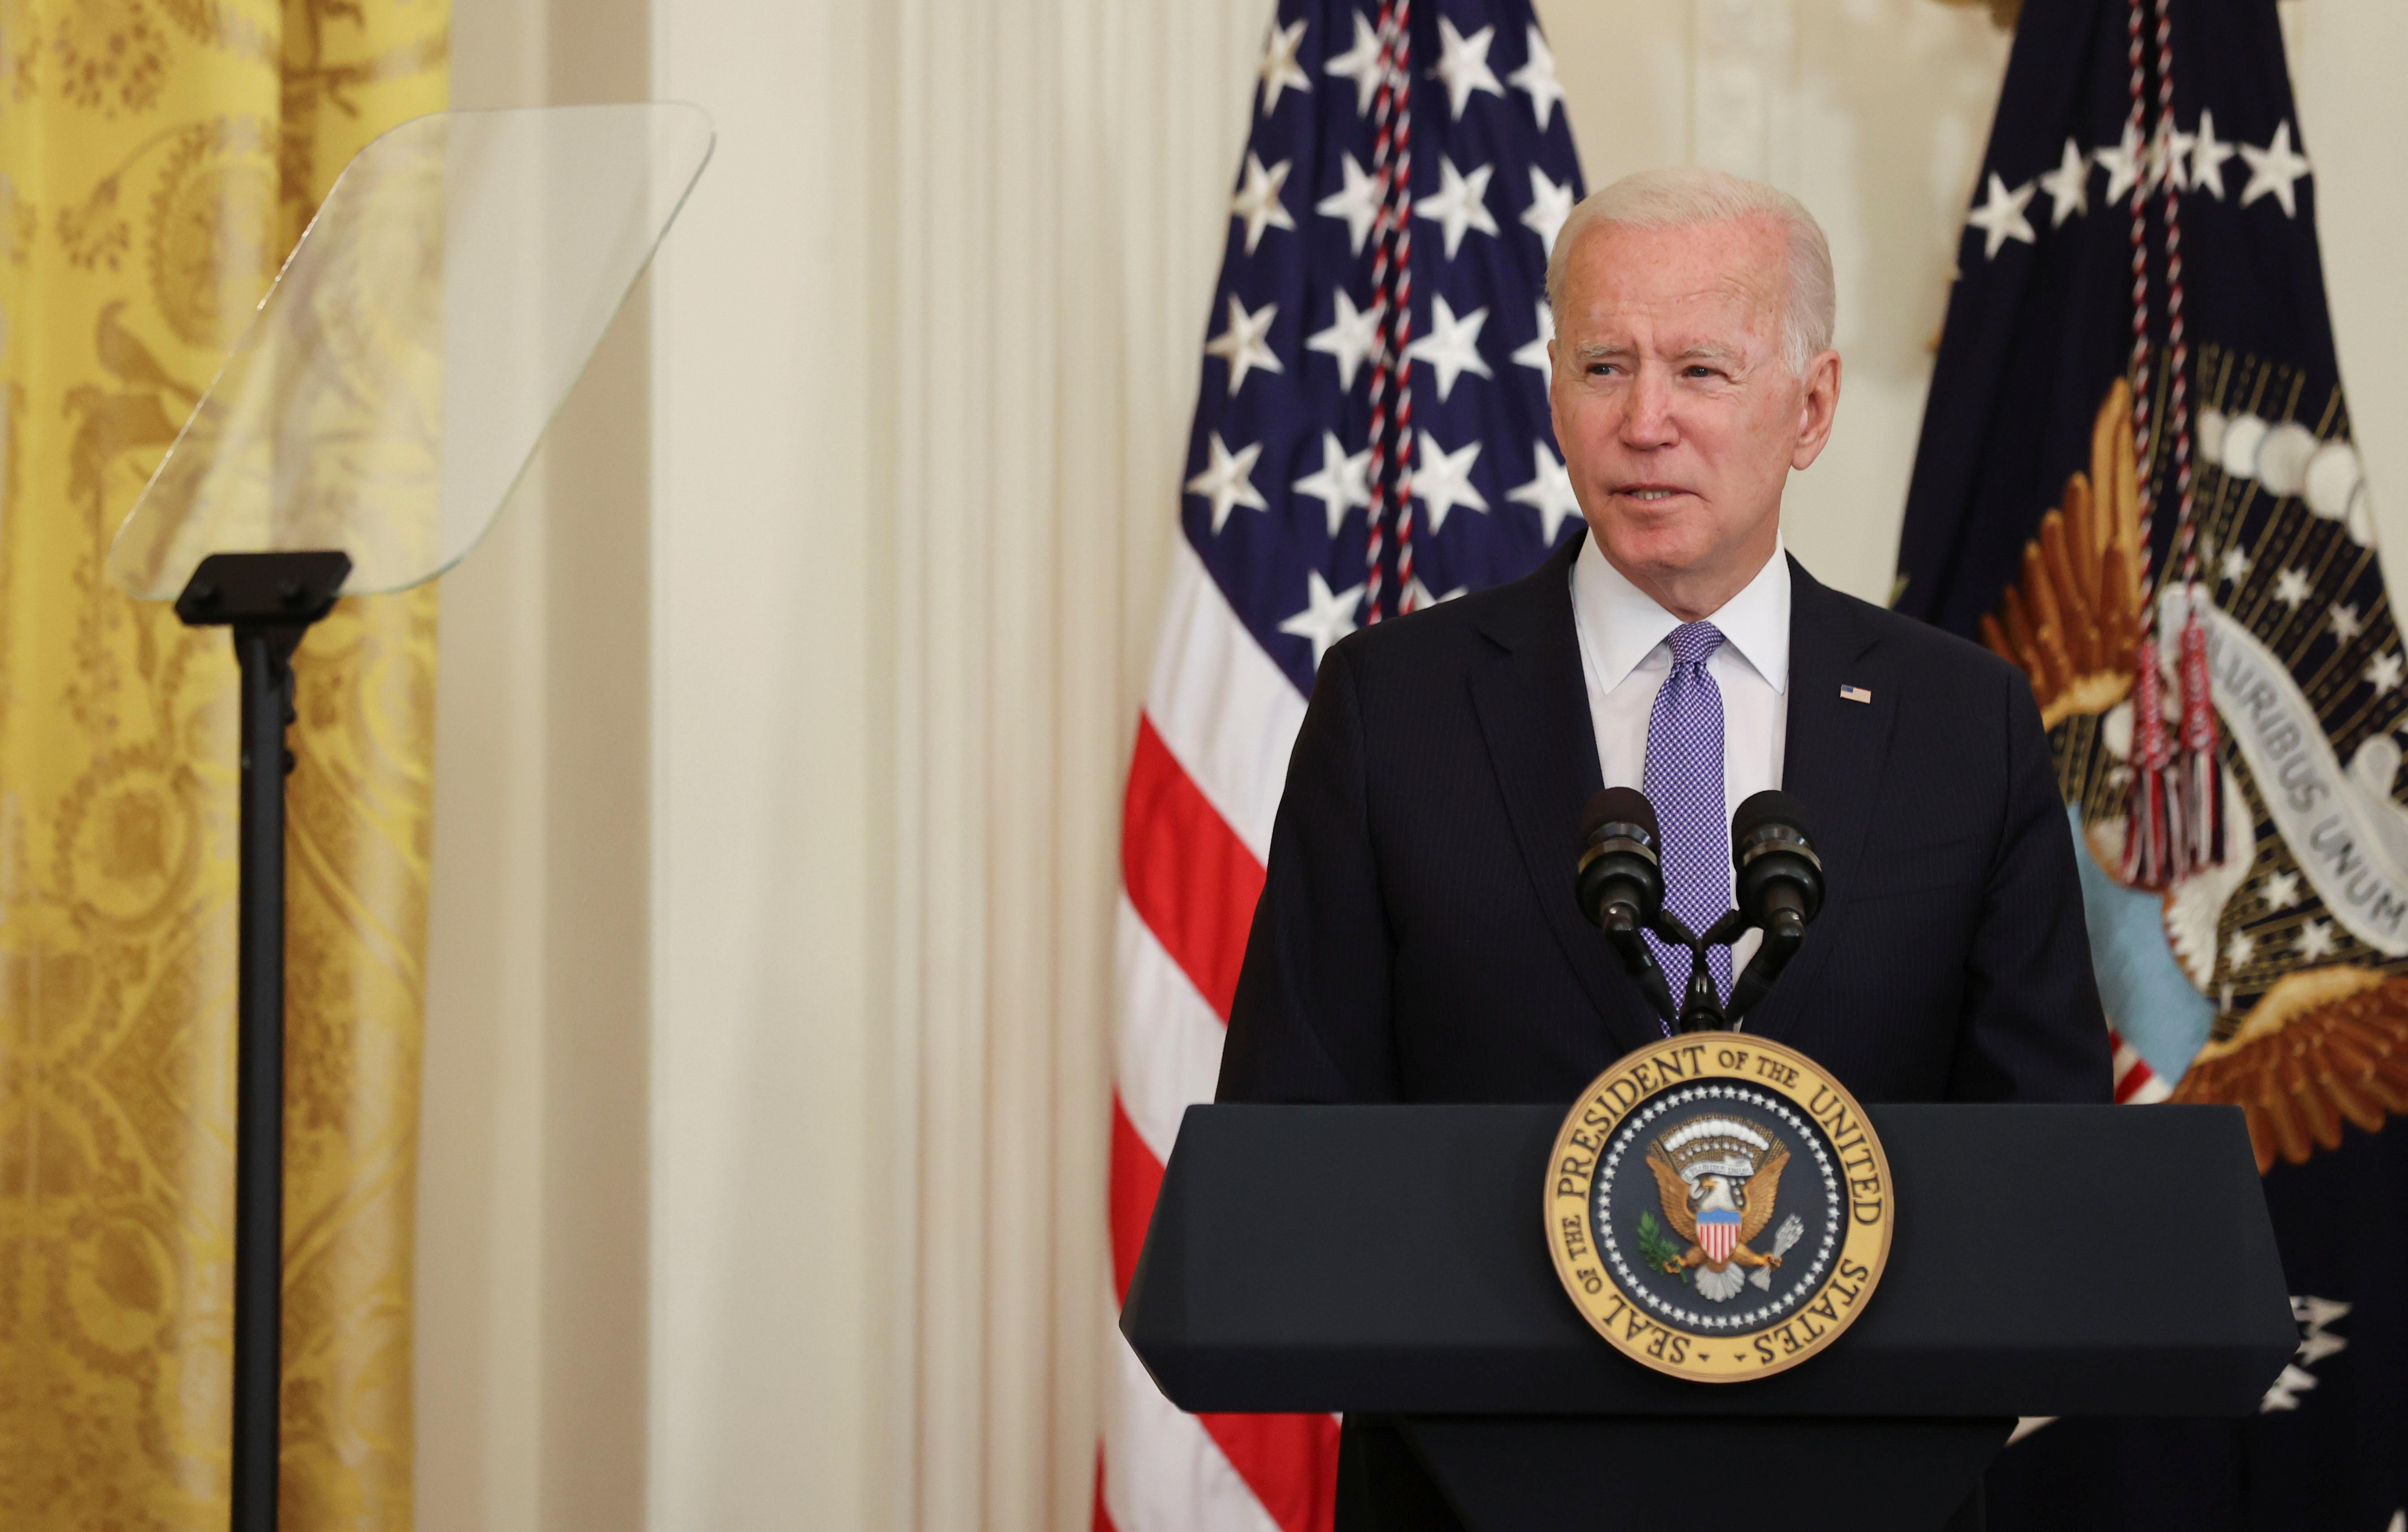 U.S. President Joe Biden delivers remarks before signing the